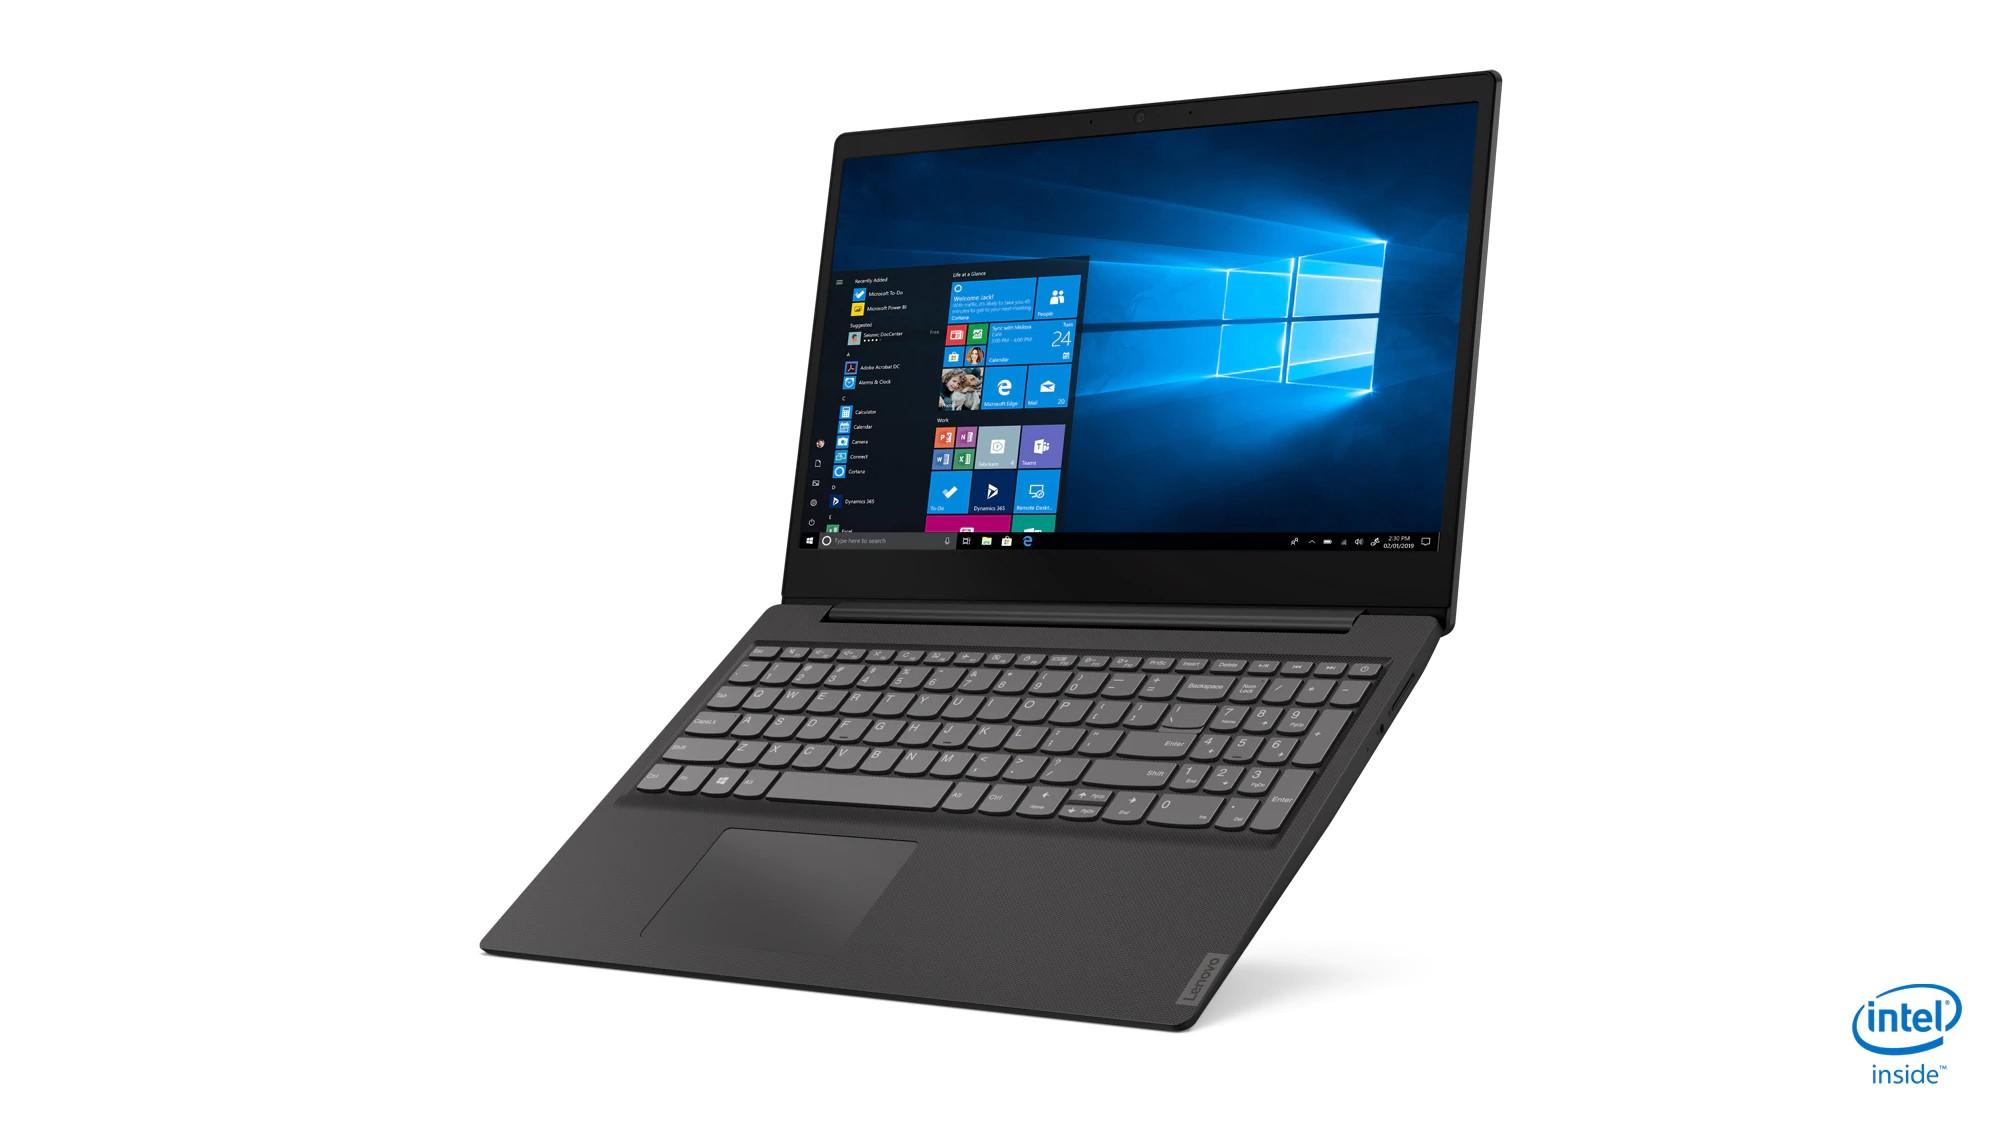 Notebook Ideapad BS145 15 HD